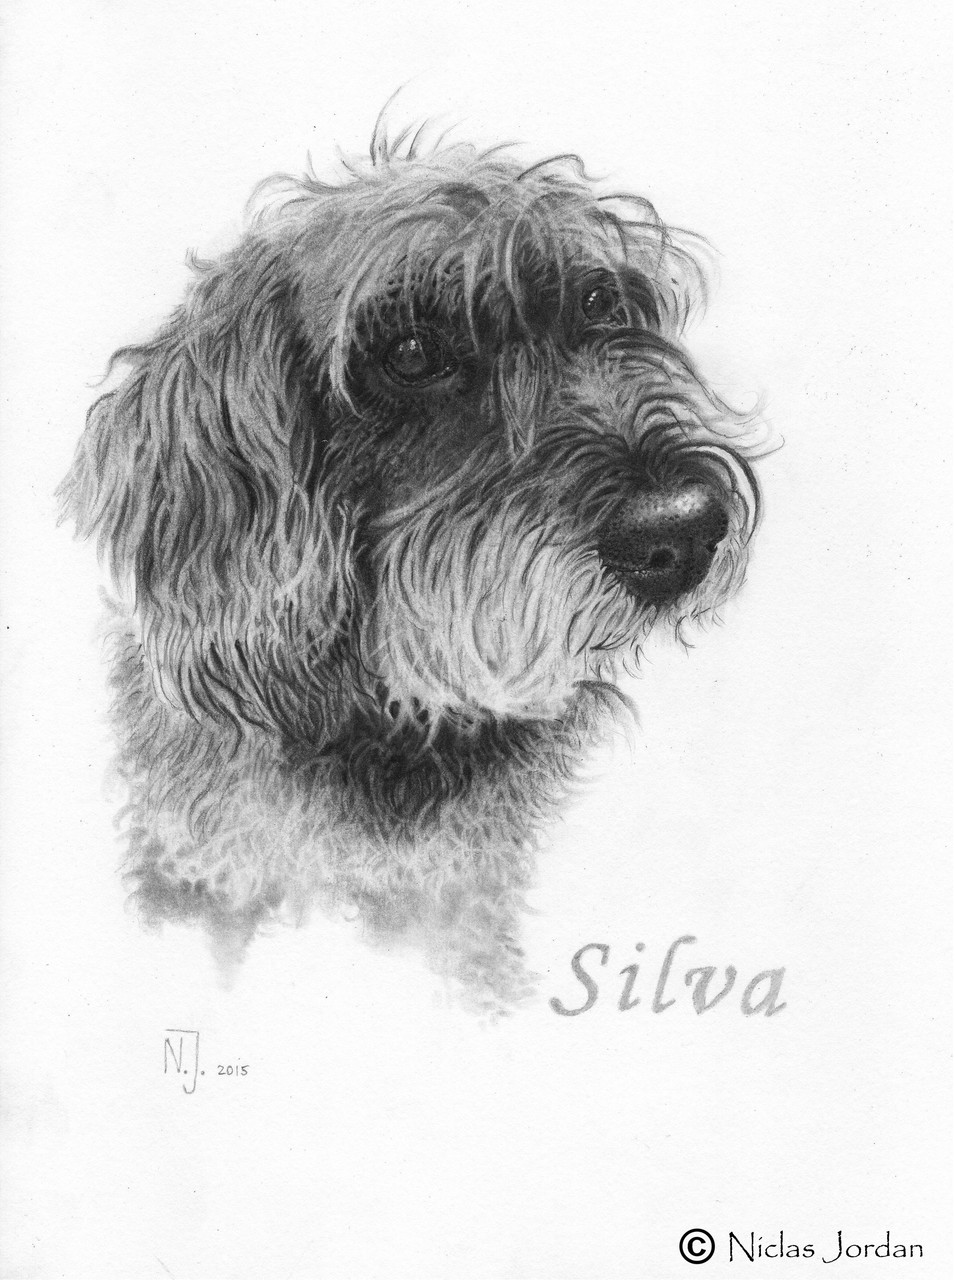 """Rauhaardackel Silva"" 2015"